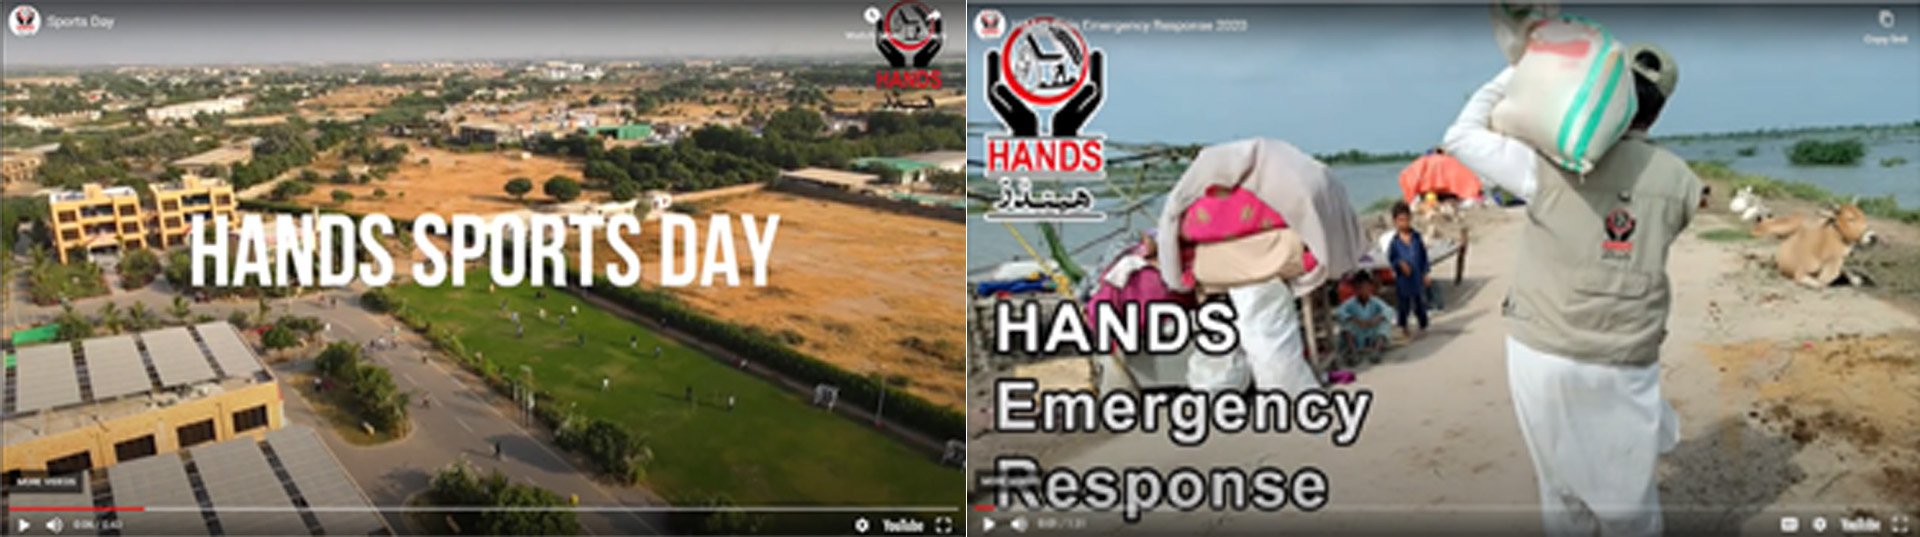 HANDS videos